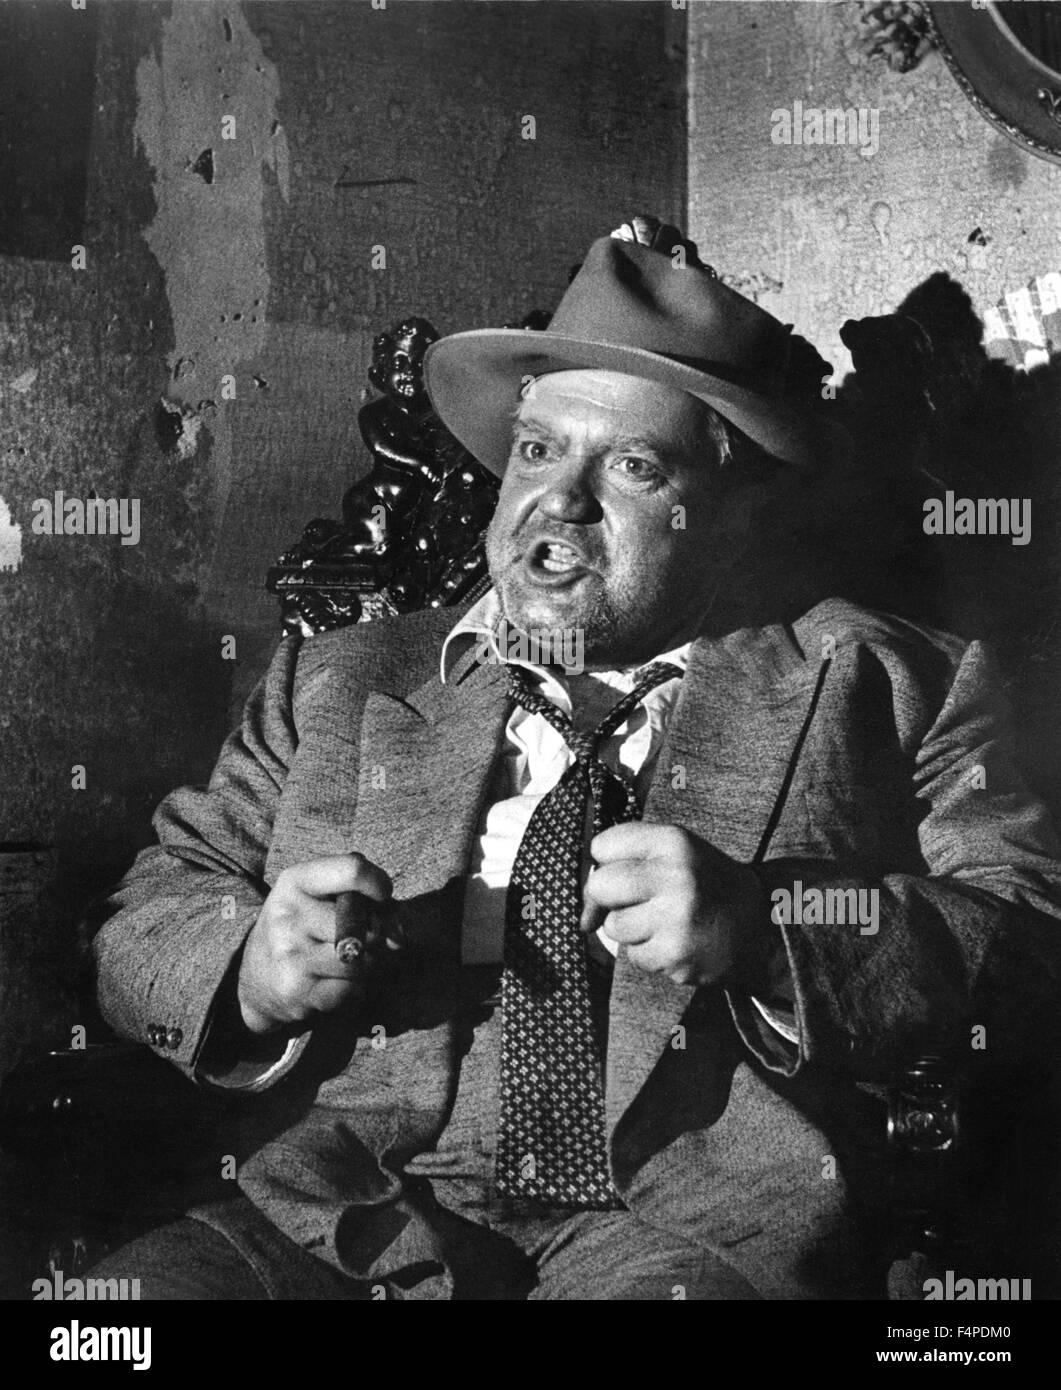 Orson Welles / Touch of Evil de 1958 dirigida por Orson Welles Foto de stock